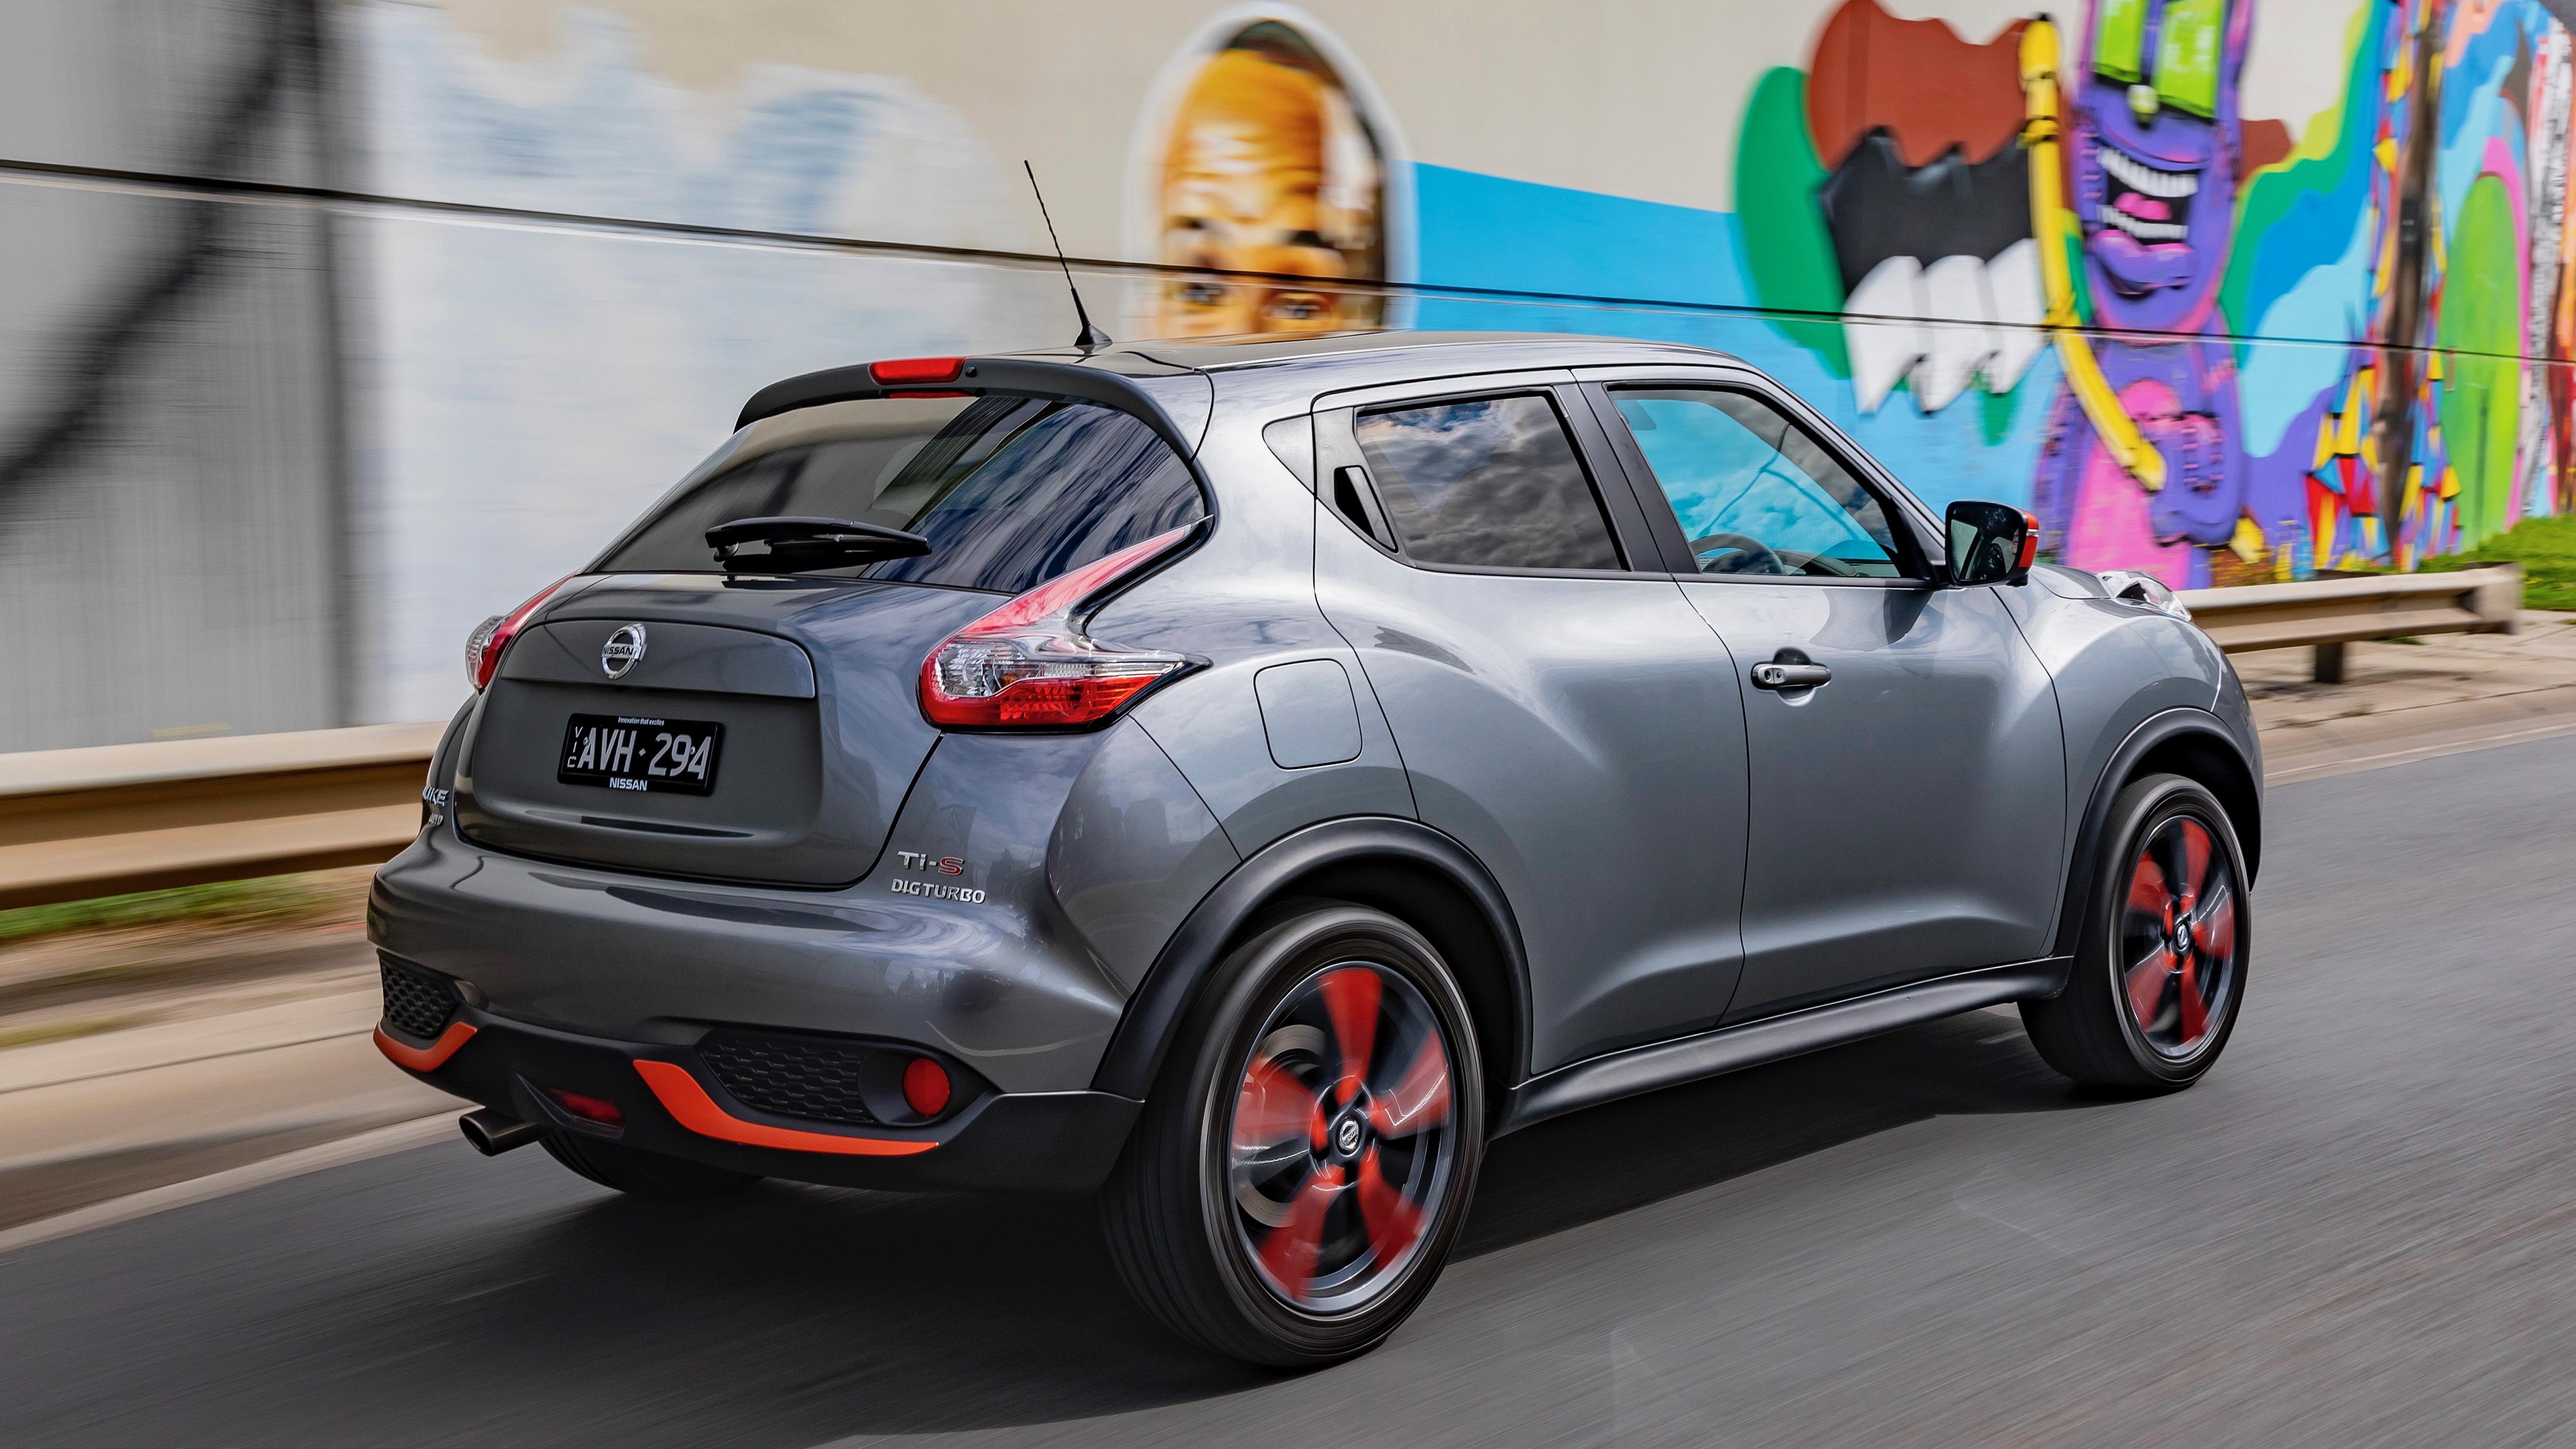 Nissan Juke gets new colour options